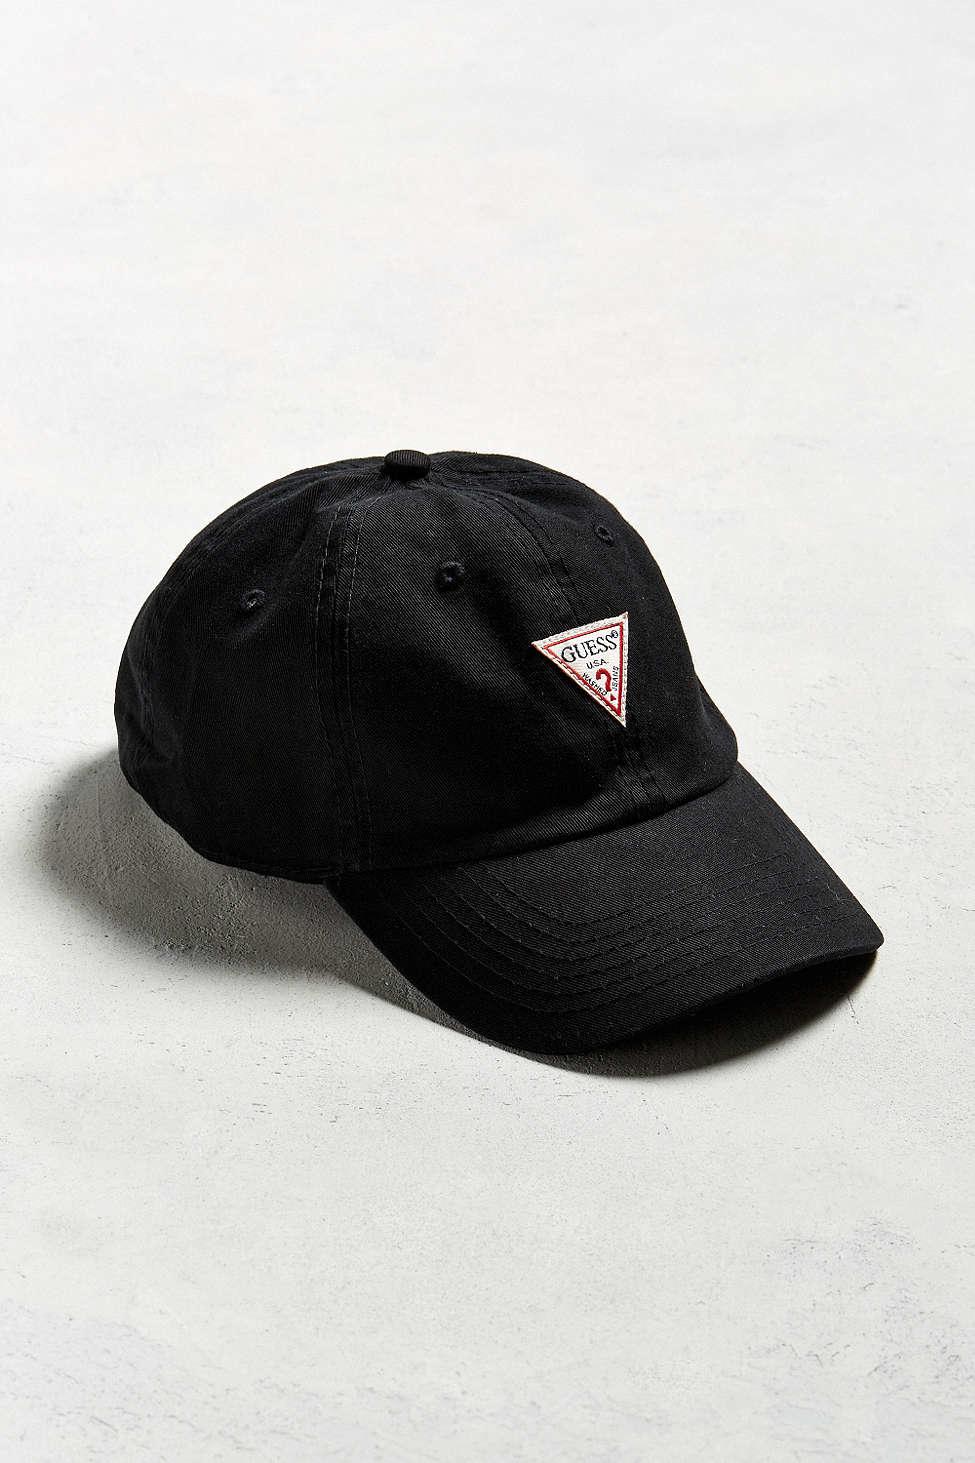 Lyst - Guess Baseball Hat in Black for Men 3ffe7ae06bd